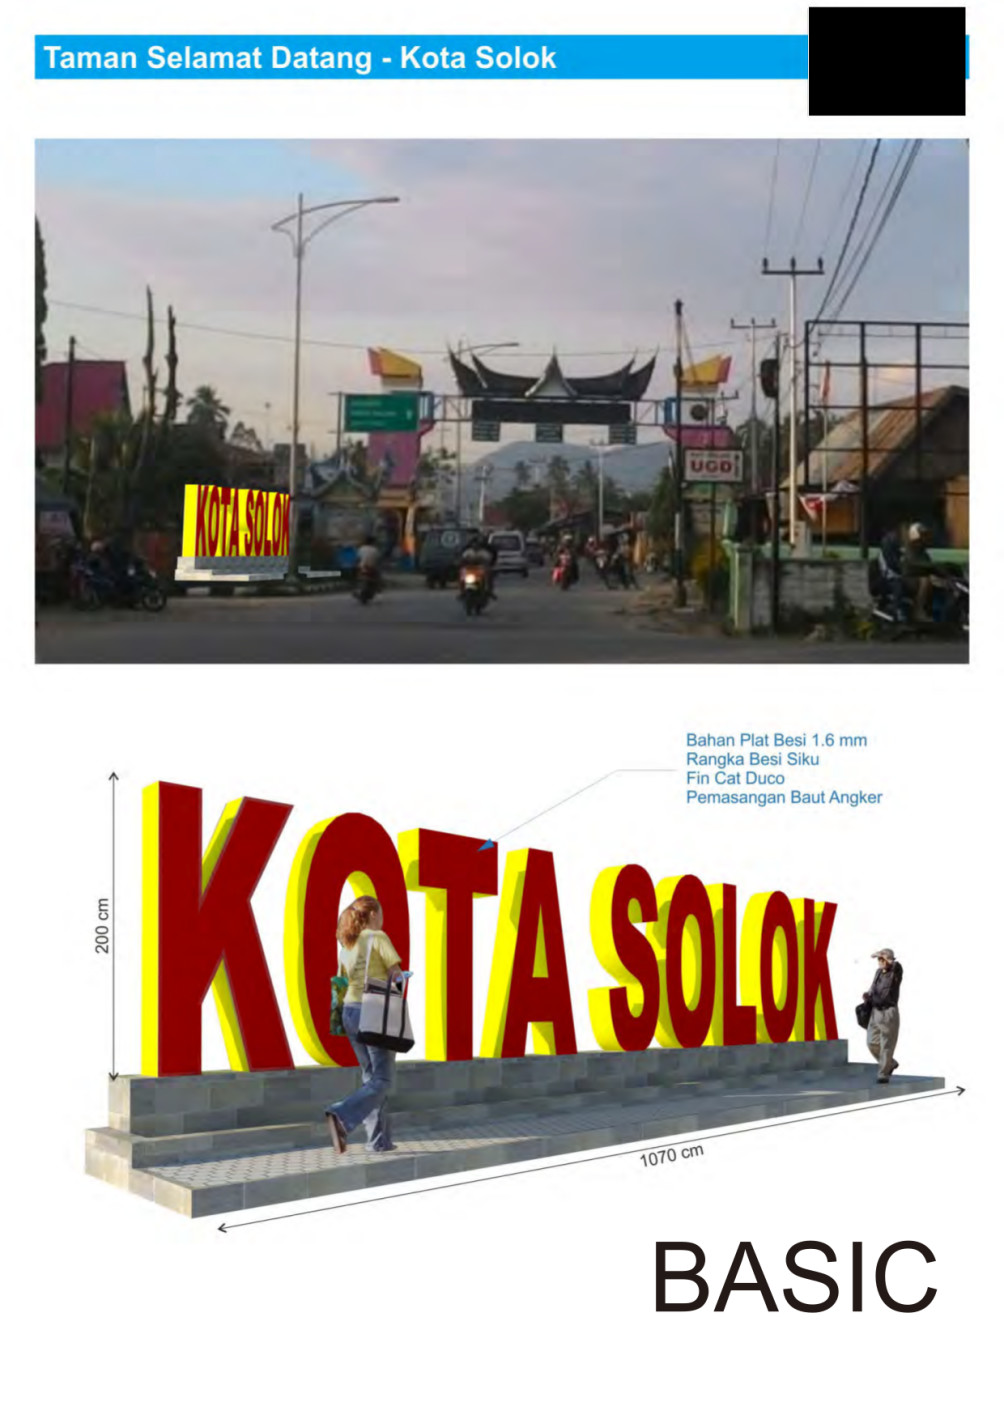 Design Signage For Your Store By Suryaimelandabp Baut Siku